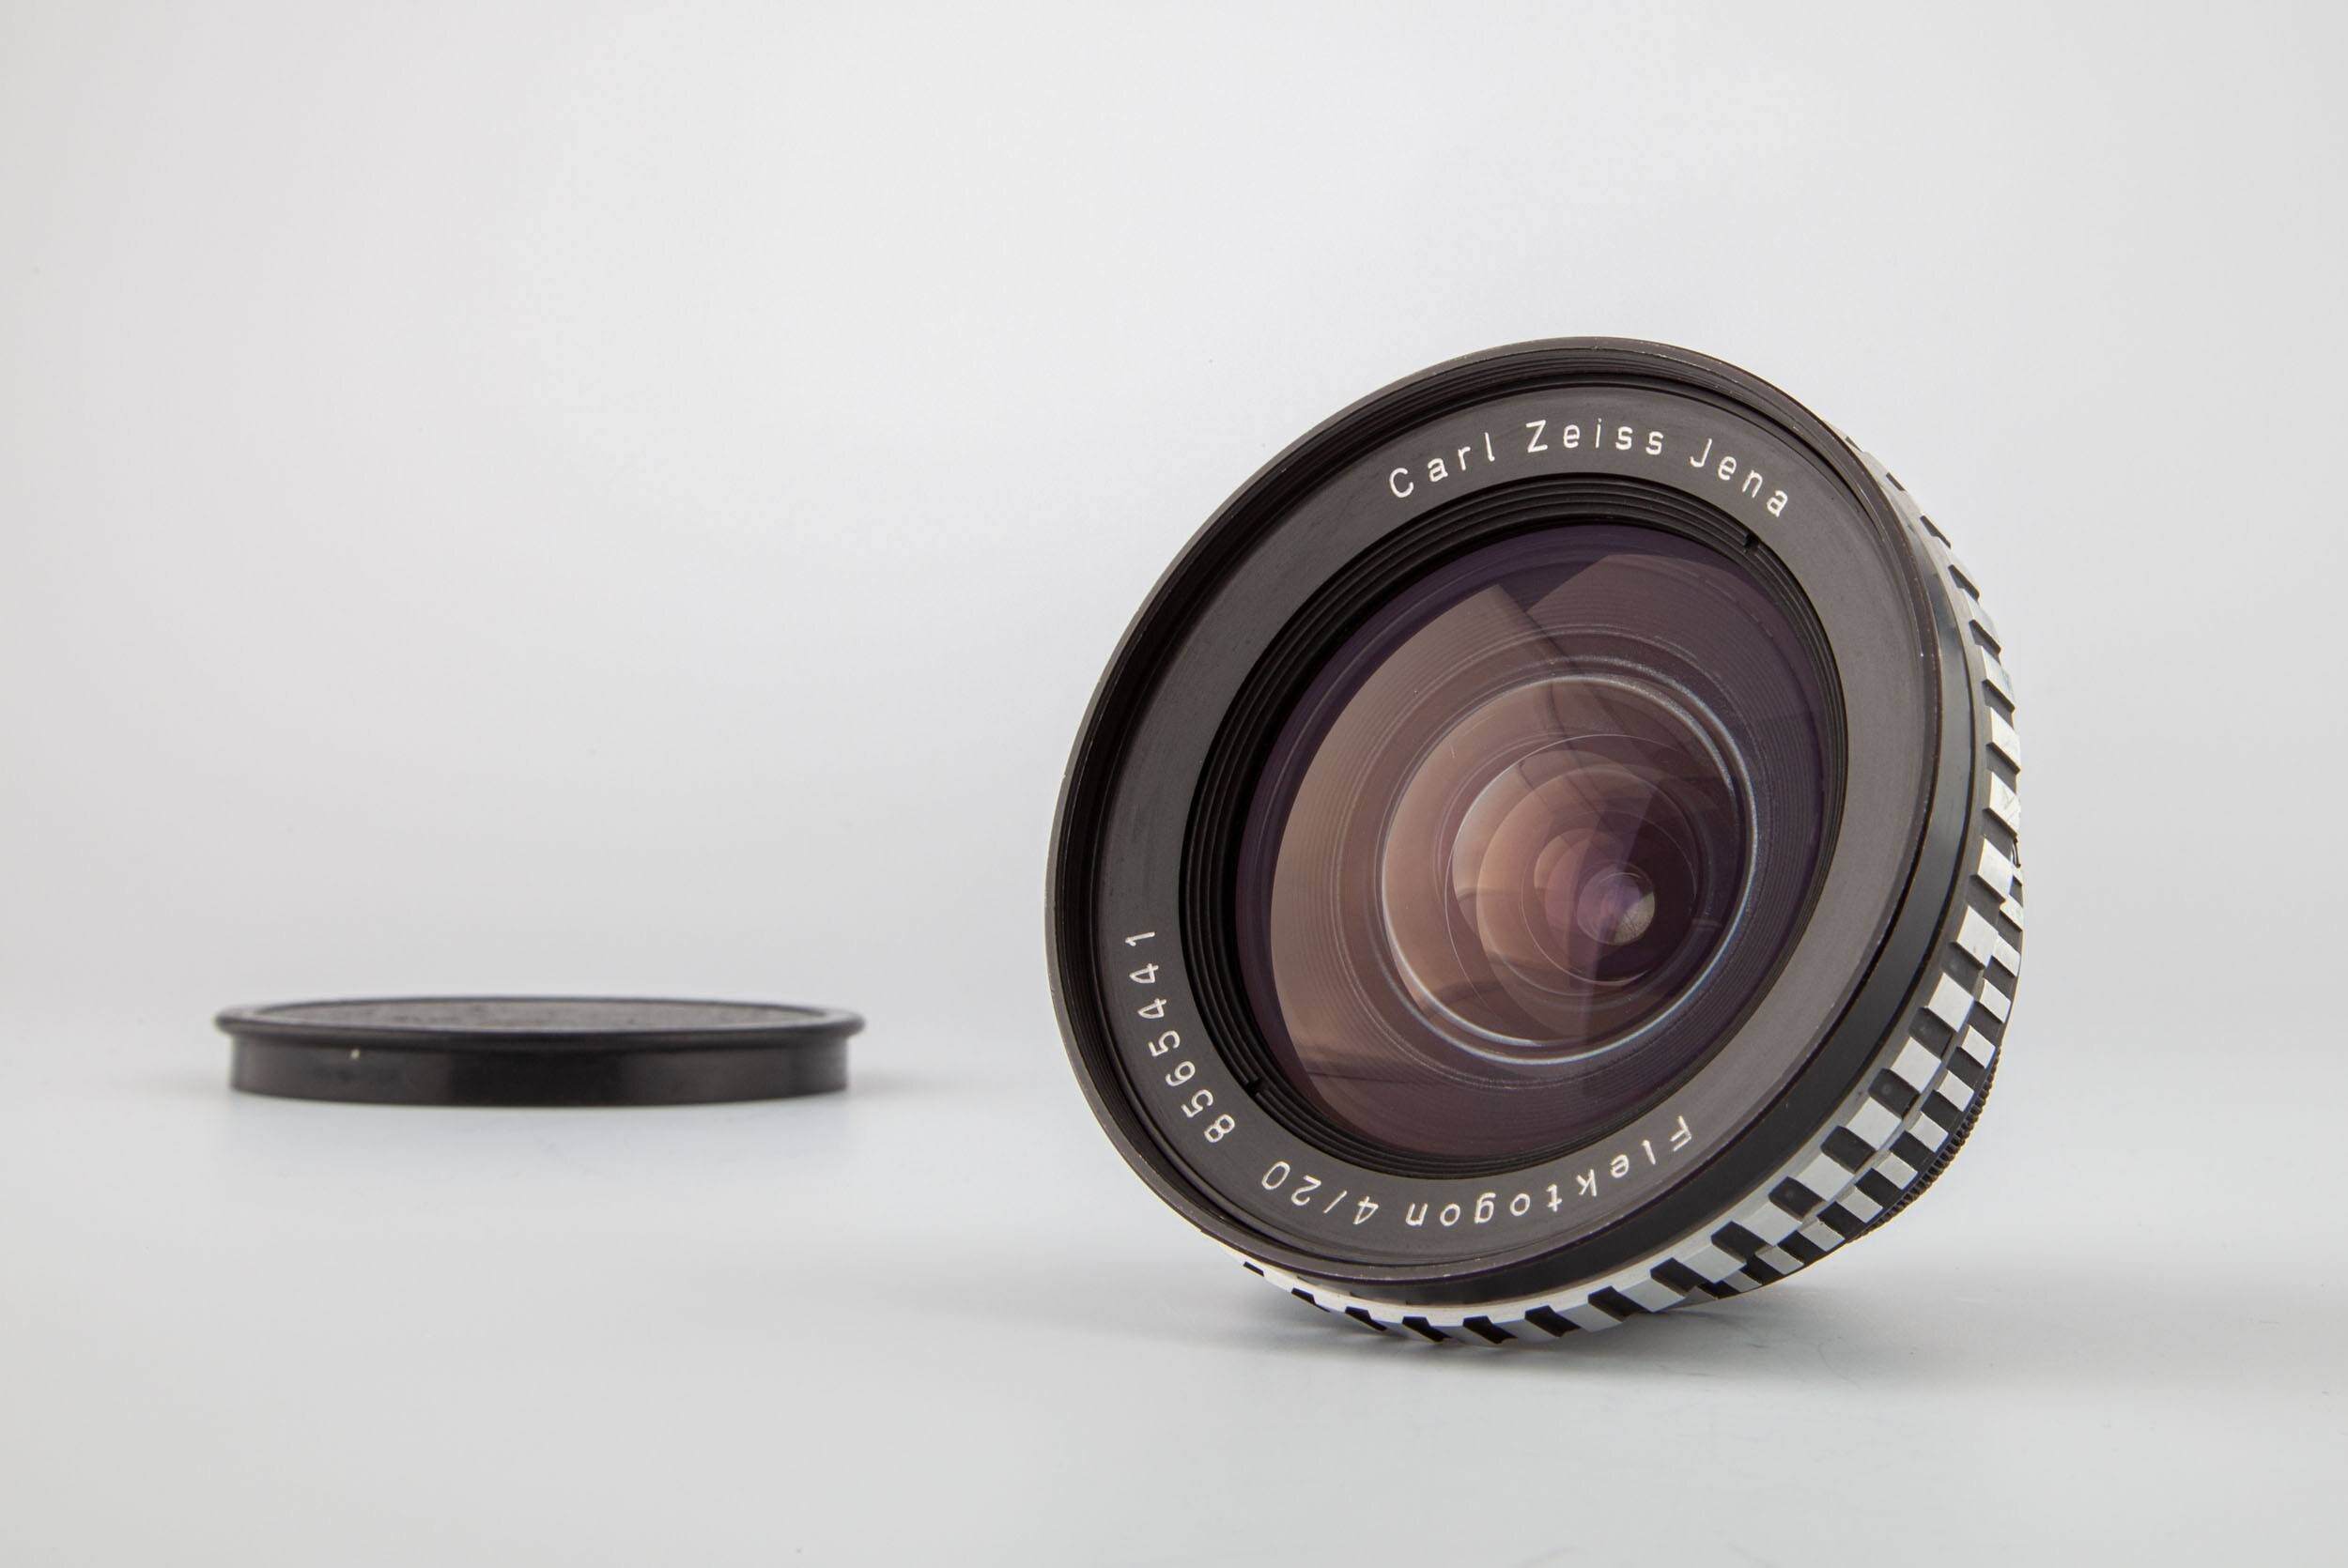 Carl Zeiss Flektogon 20mm F4